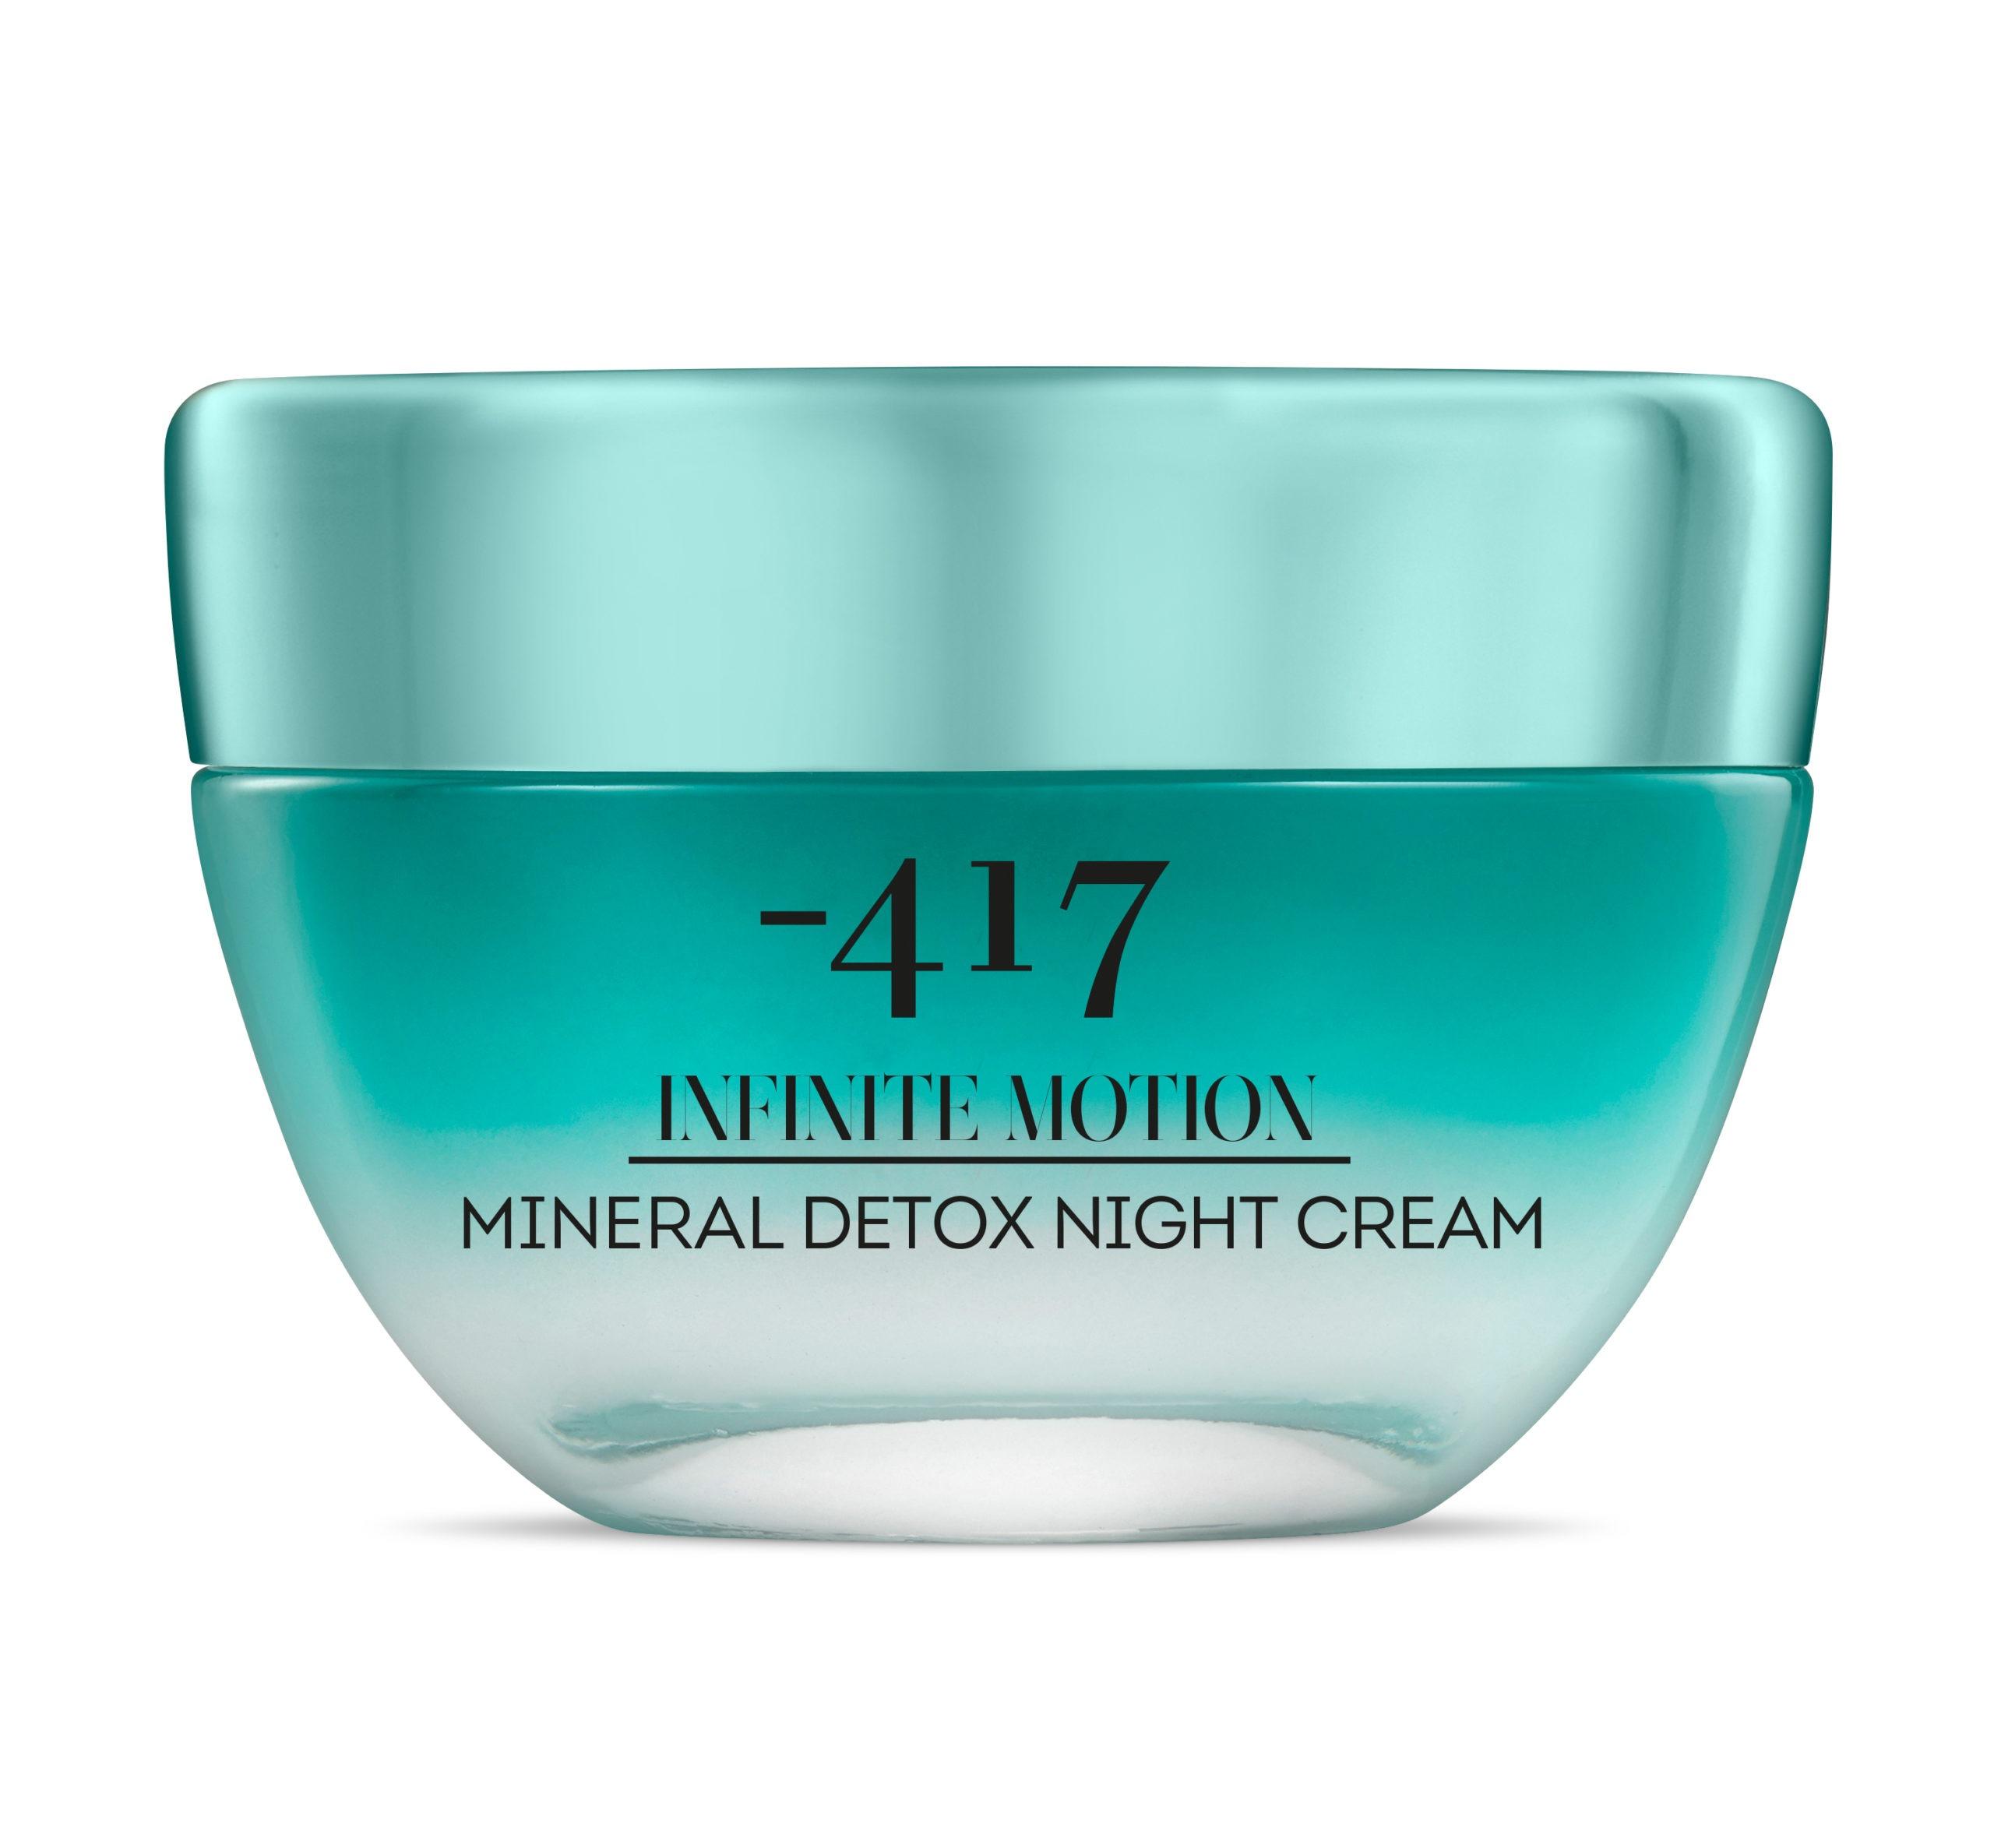 807-Mineral-Detox-Night-Cream-scaled